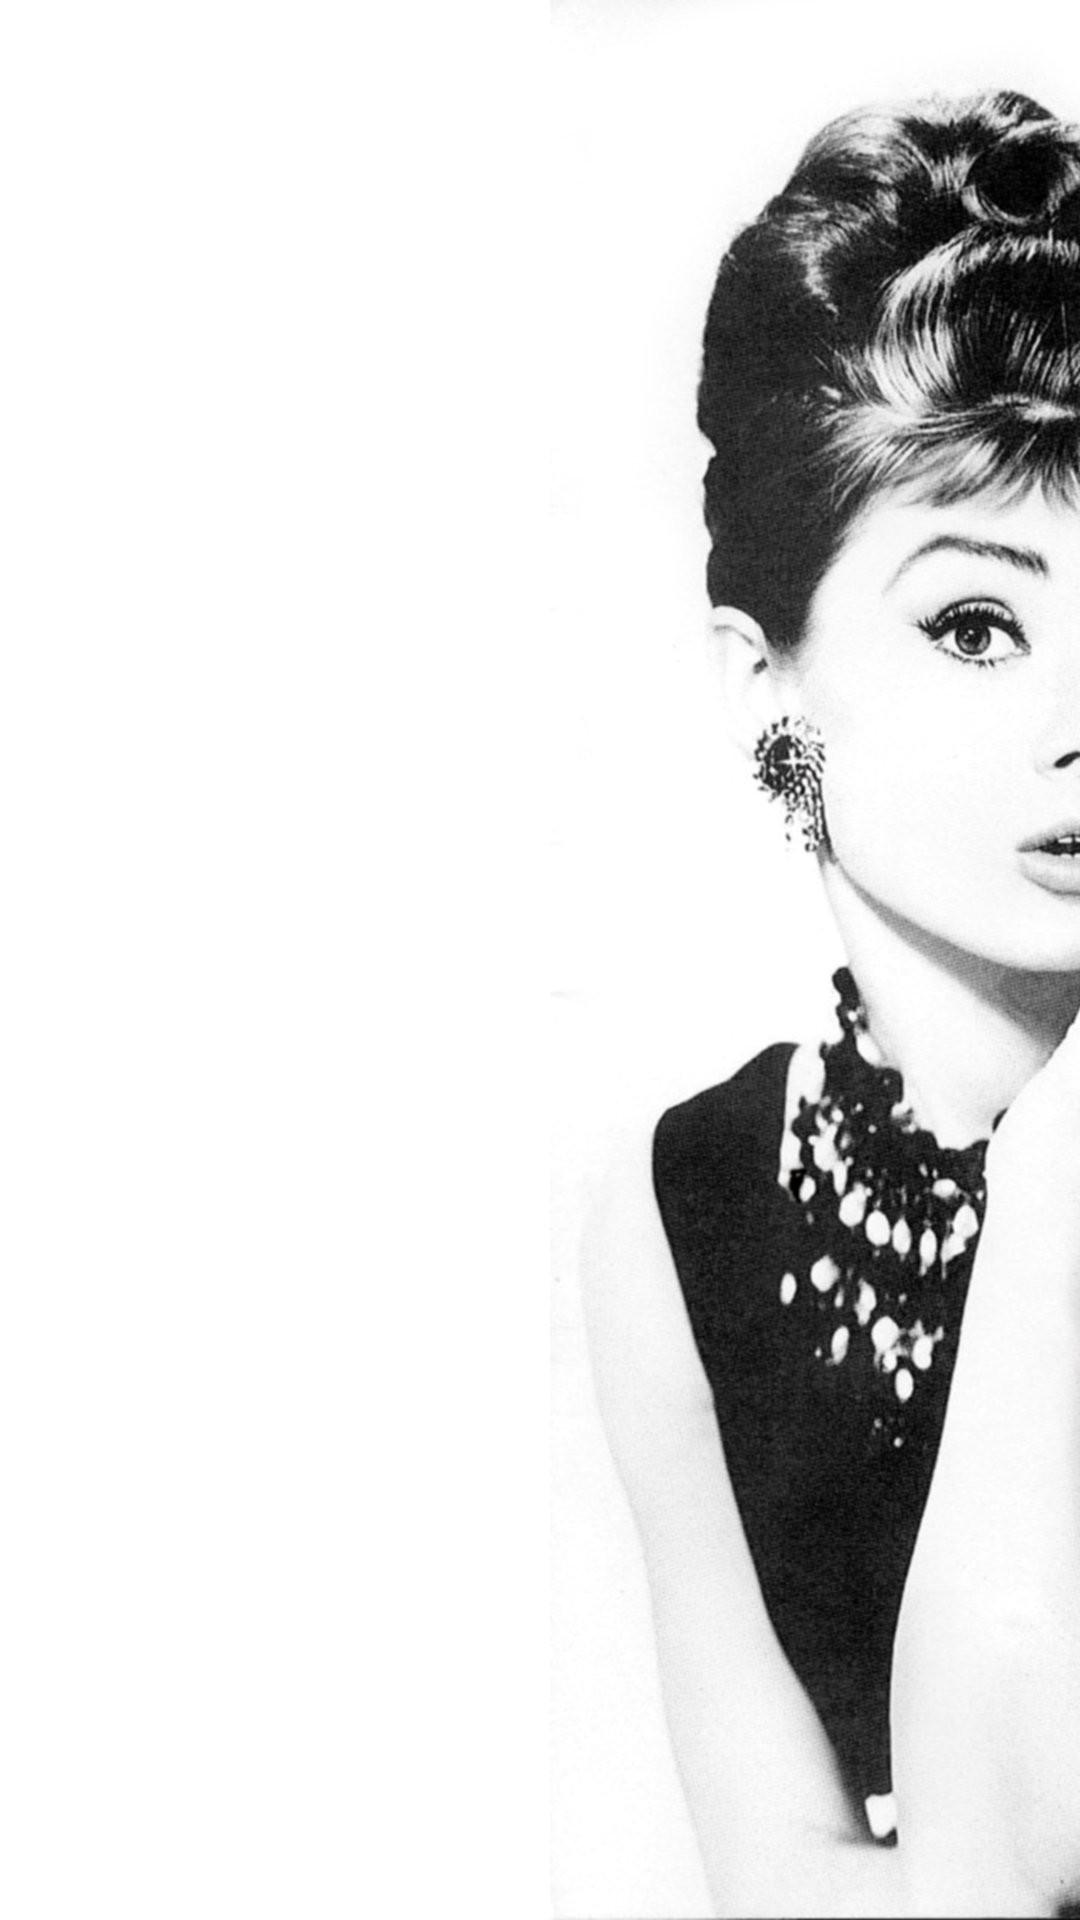 Download Audrey Hepburn Wallpaper for Android 1080x1920